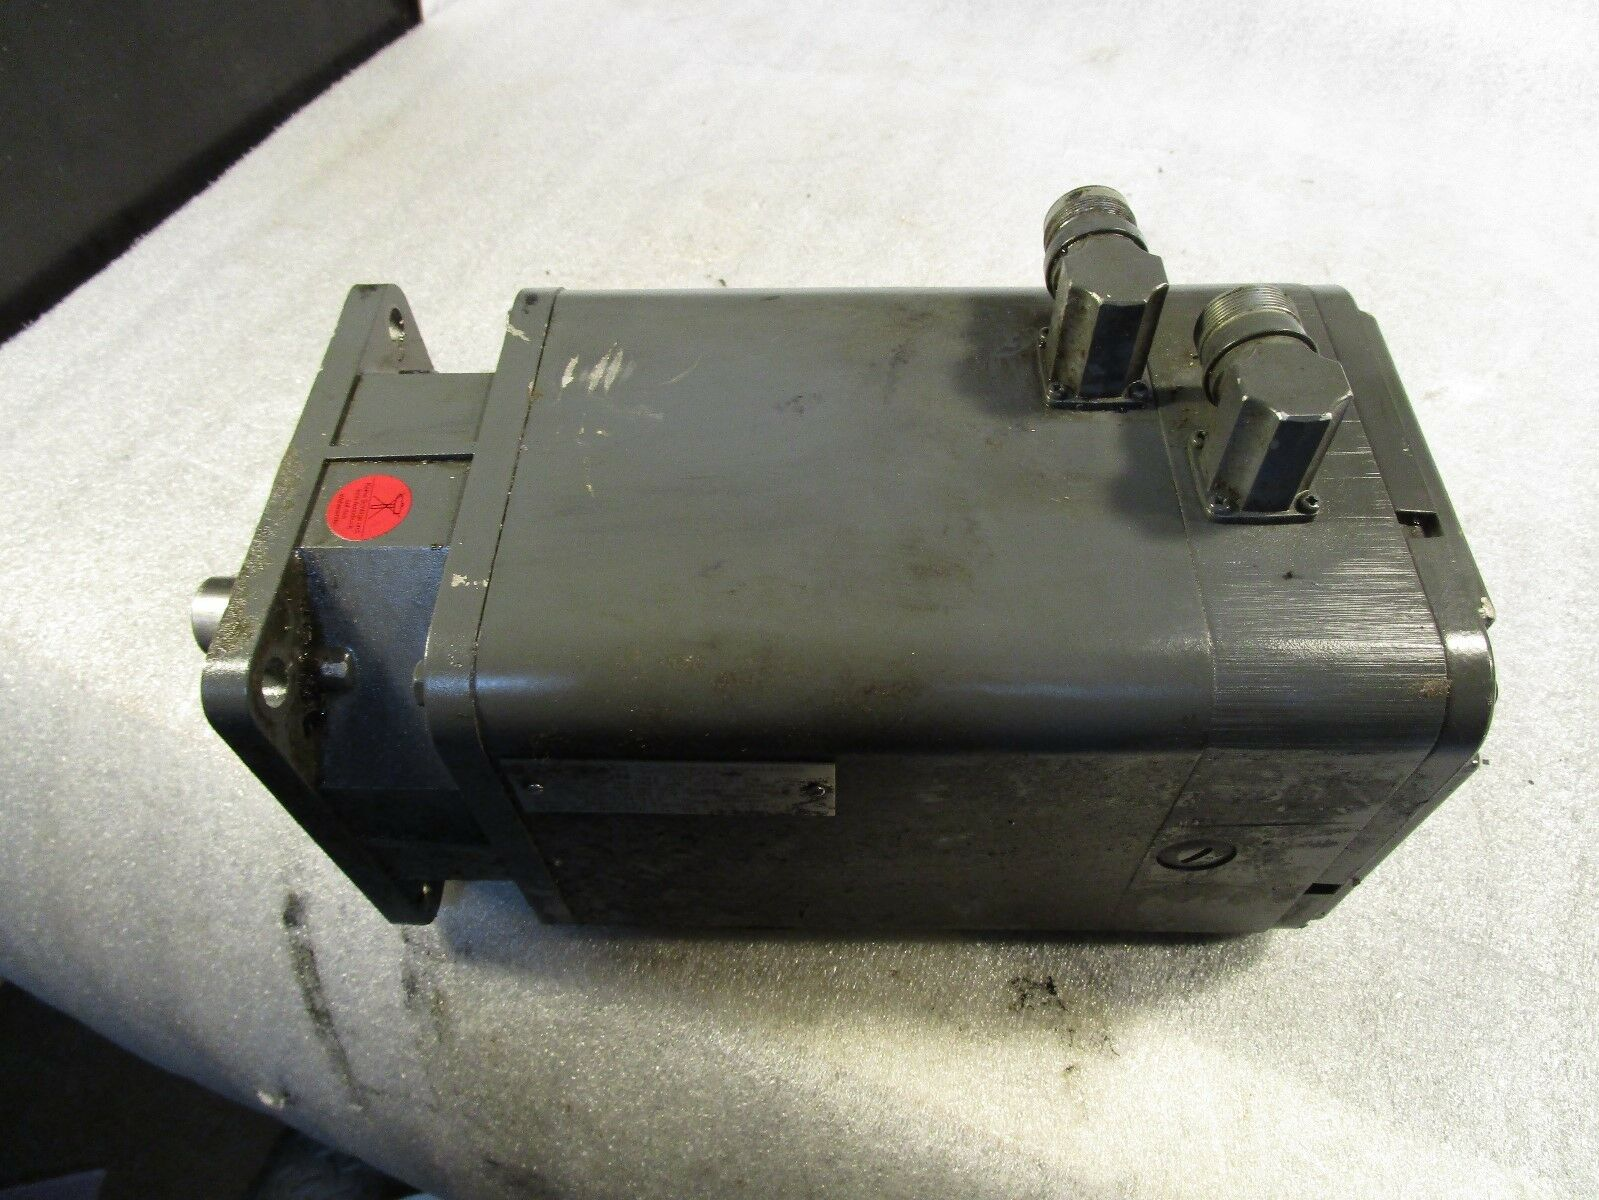 Siemens AC Servo Motor 1FT5072-0AC71-1-Z CMI Part# 1-606-3609